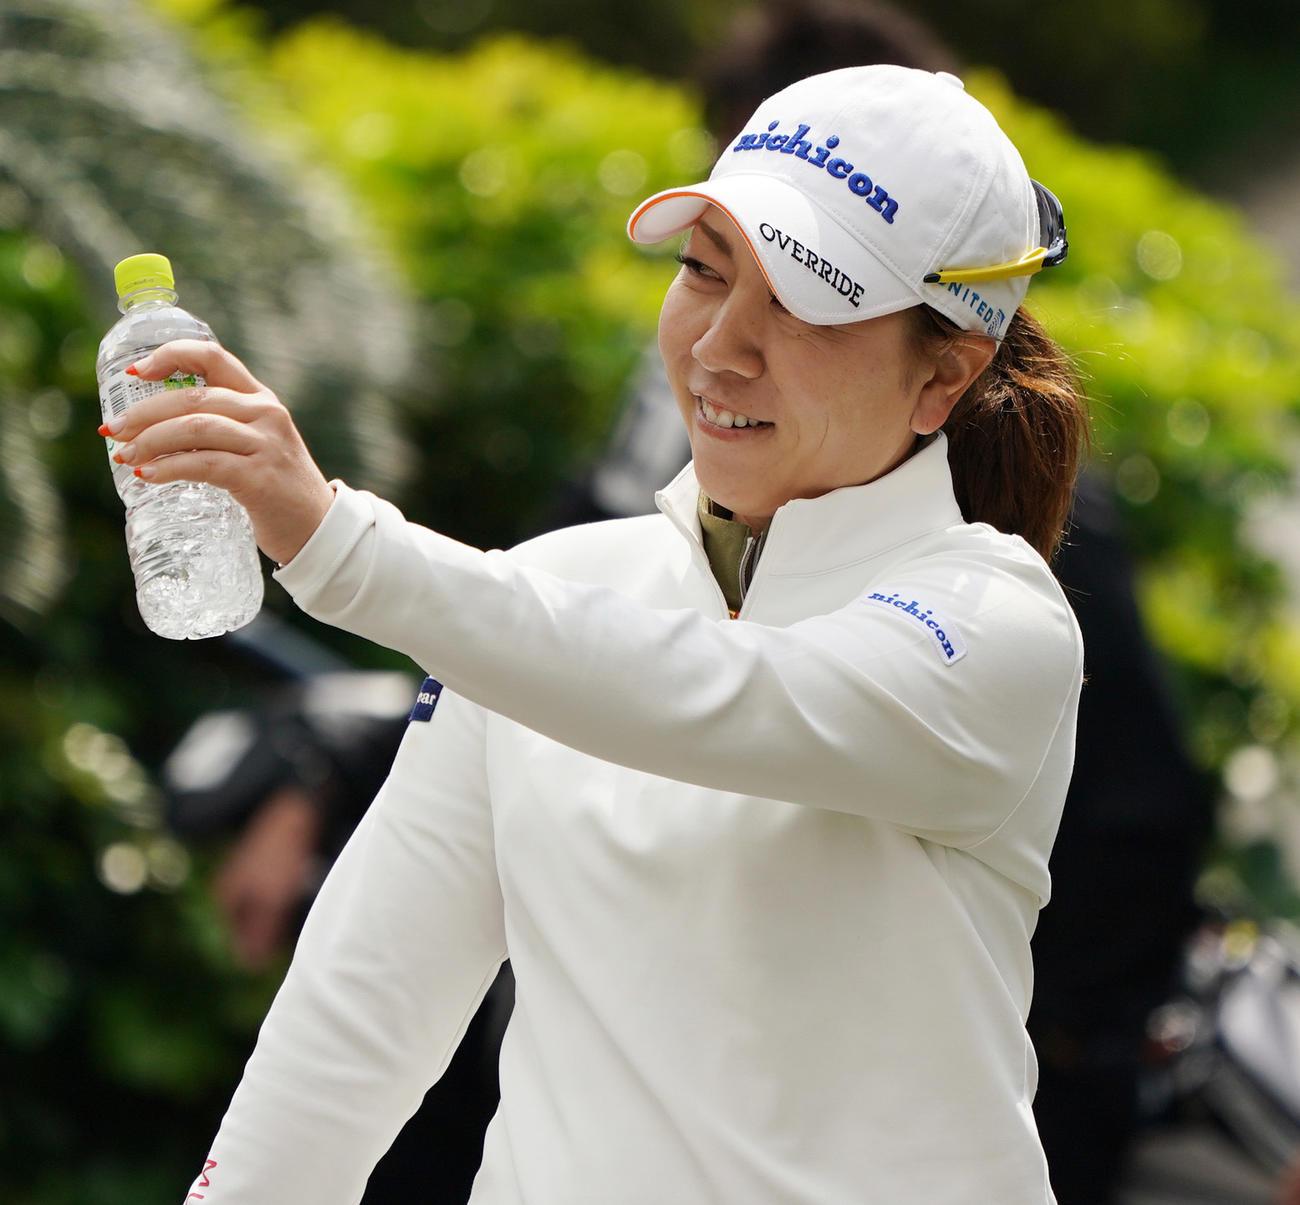 https://www.nikkansports.com/sports/golf/news/img/202103020000264-w1300_19.jpg